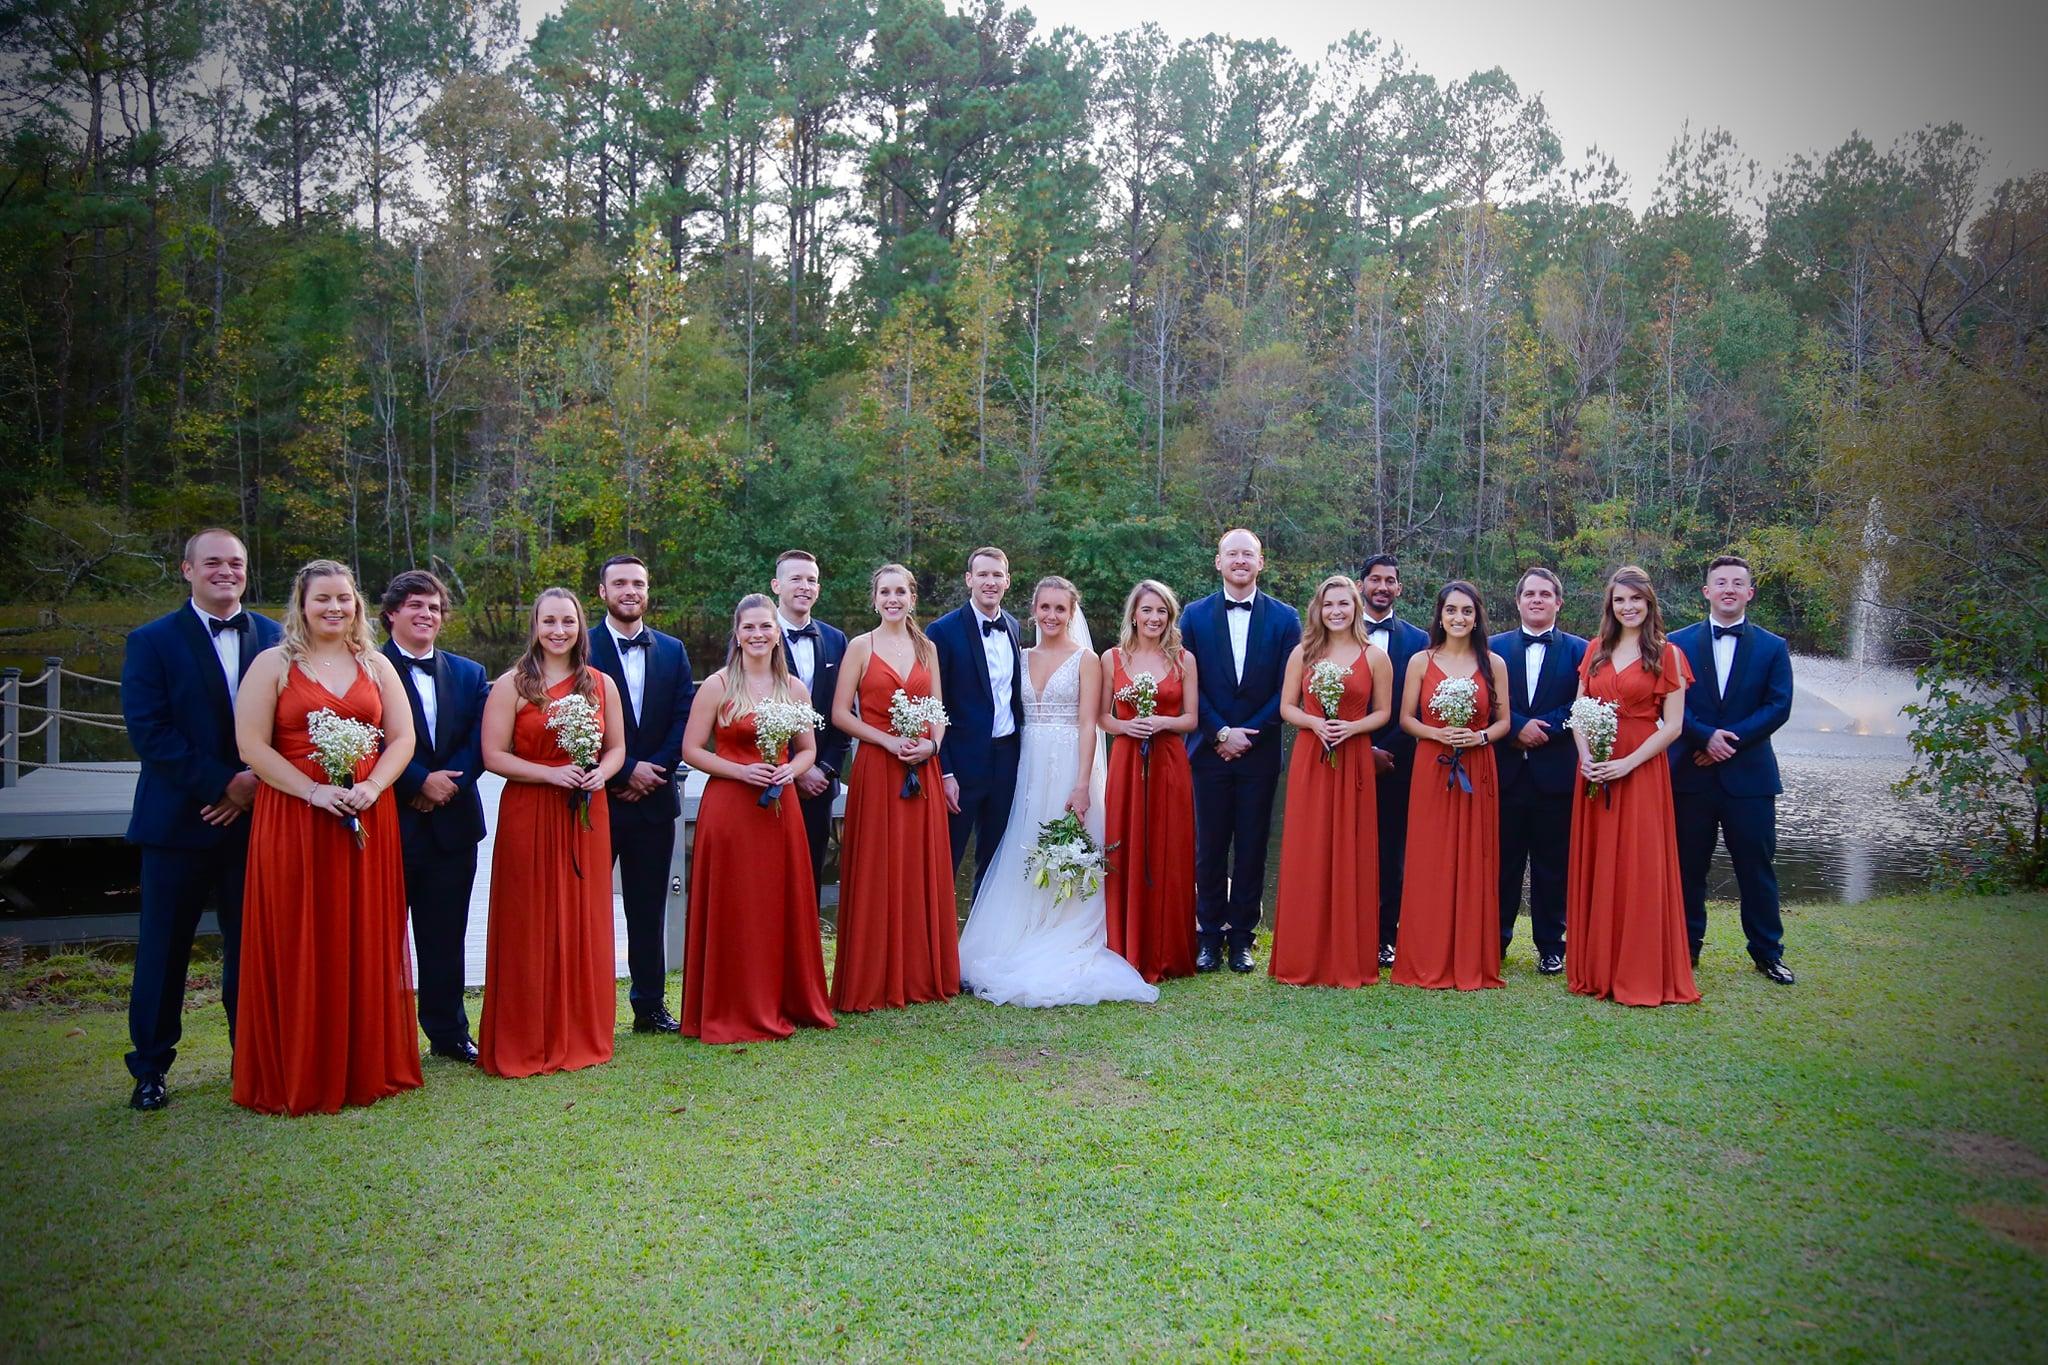 wedding party photo inspiration with burnt orange bridesmaid dresses